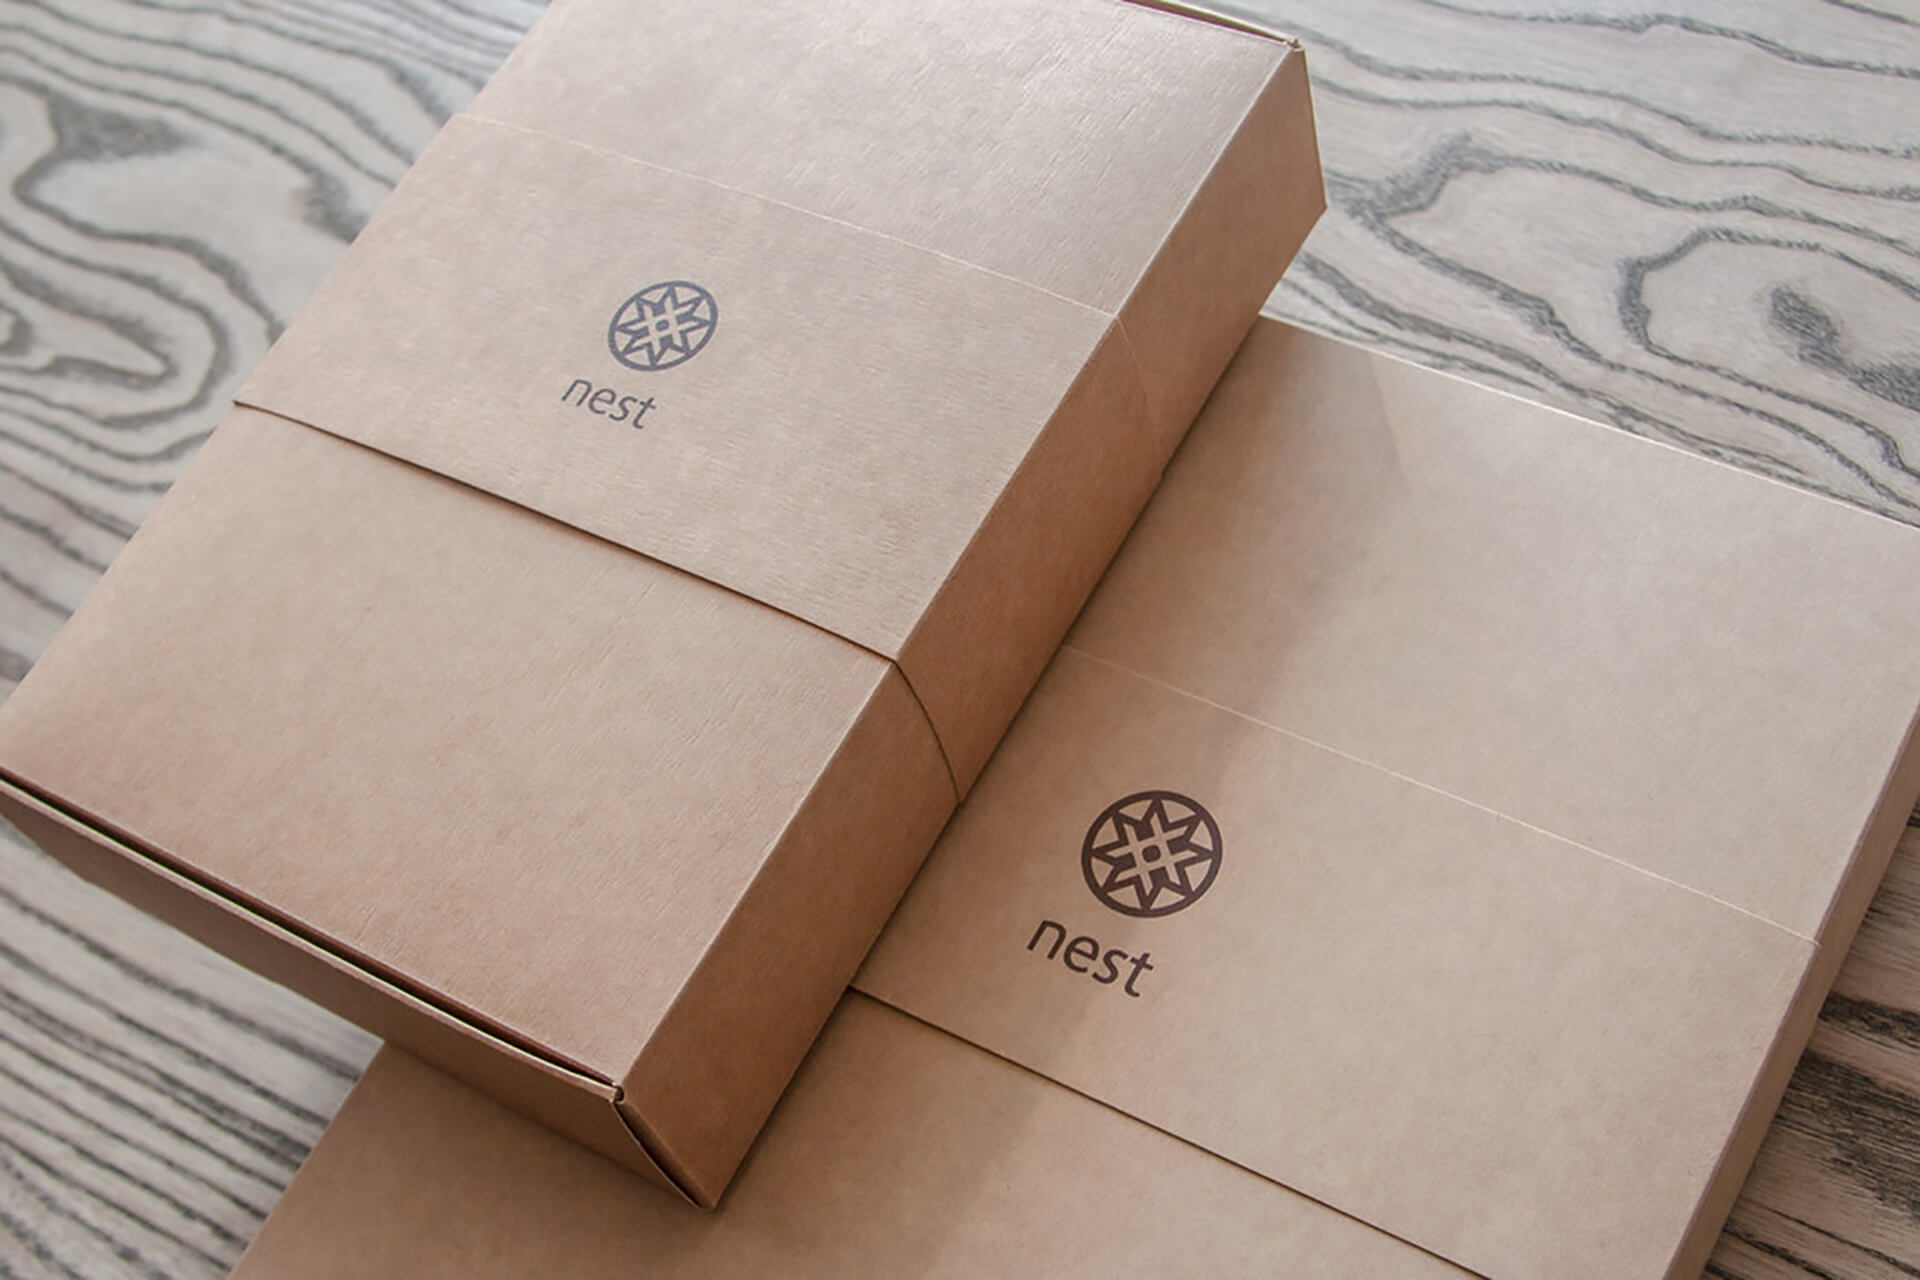 NEST家居用品品牌视觉w88手机官网平台首页